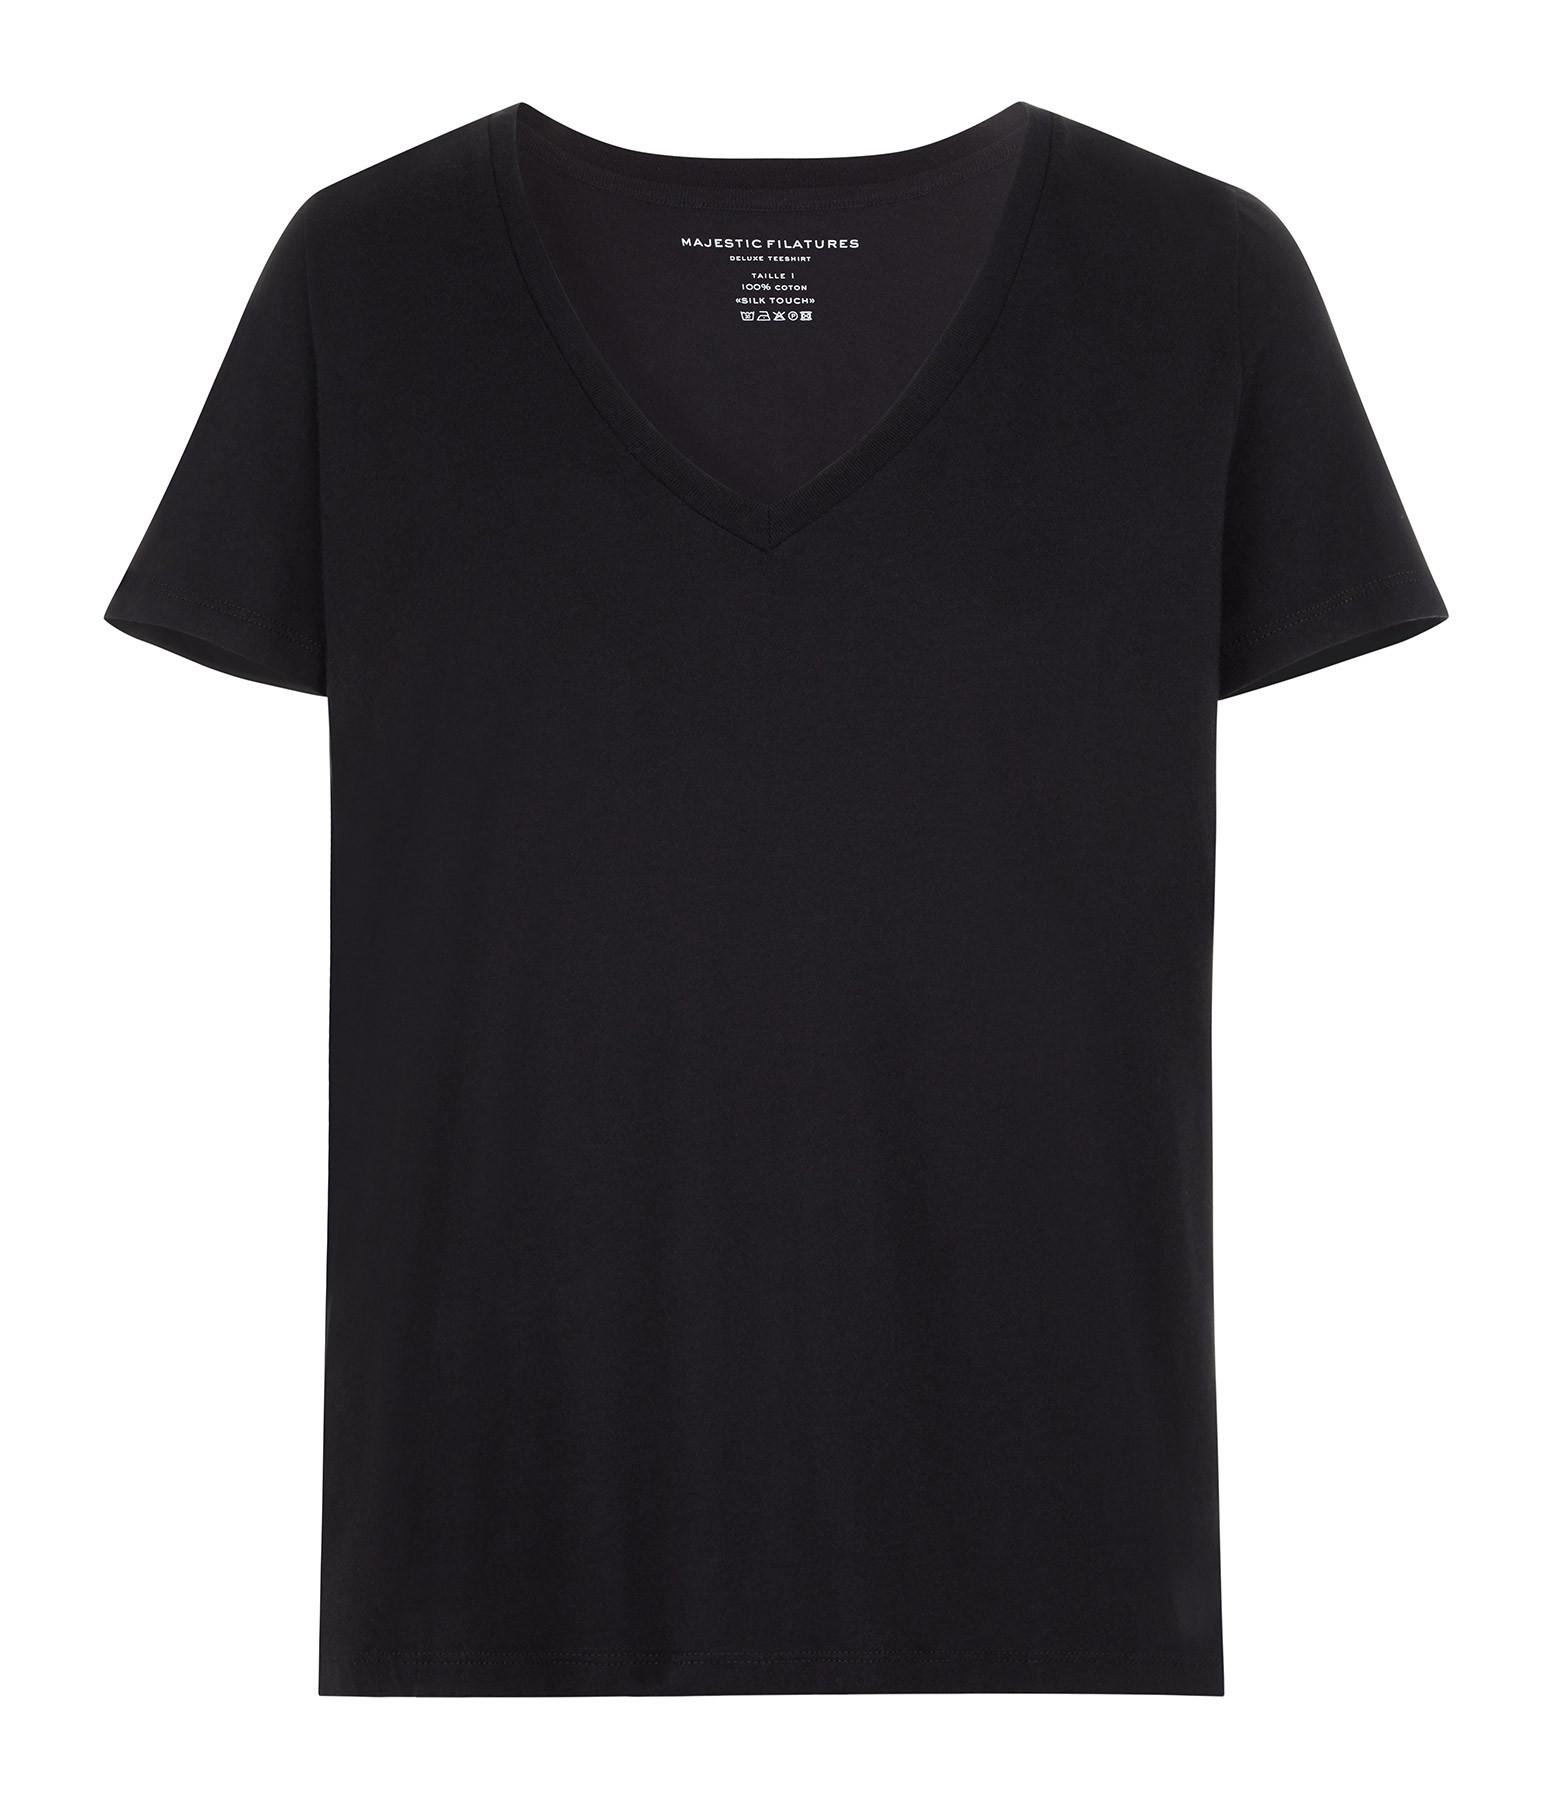 MAJESTIC FILATURES - Tee-shirt Col V Coton Noir